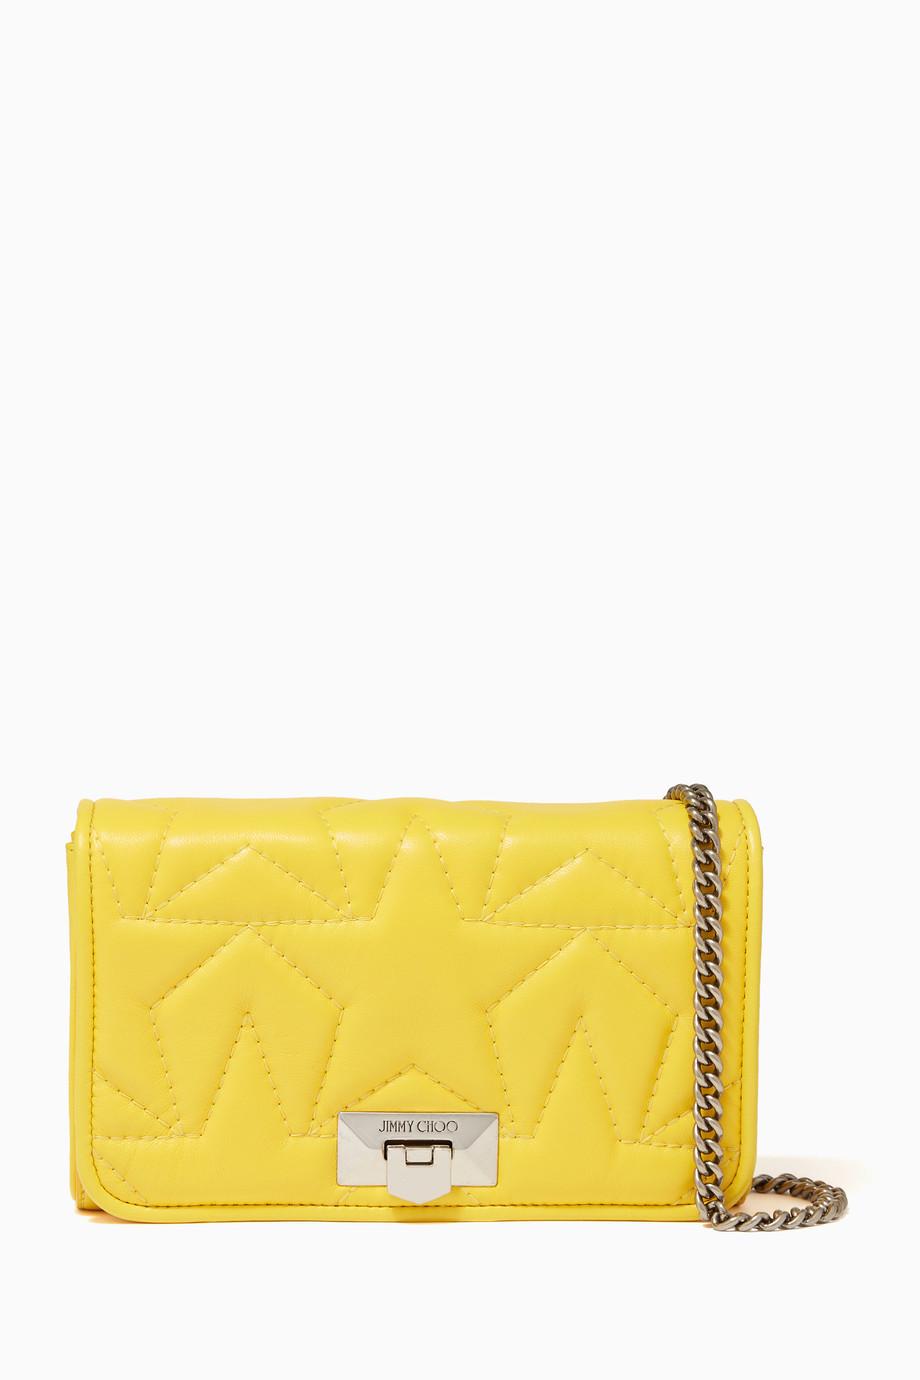 31aaf89a2dc Shop Jimmy Choo Yellow Helia Leather Clutch Bag for Women | Ounass